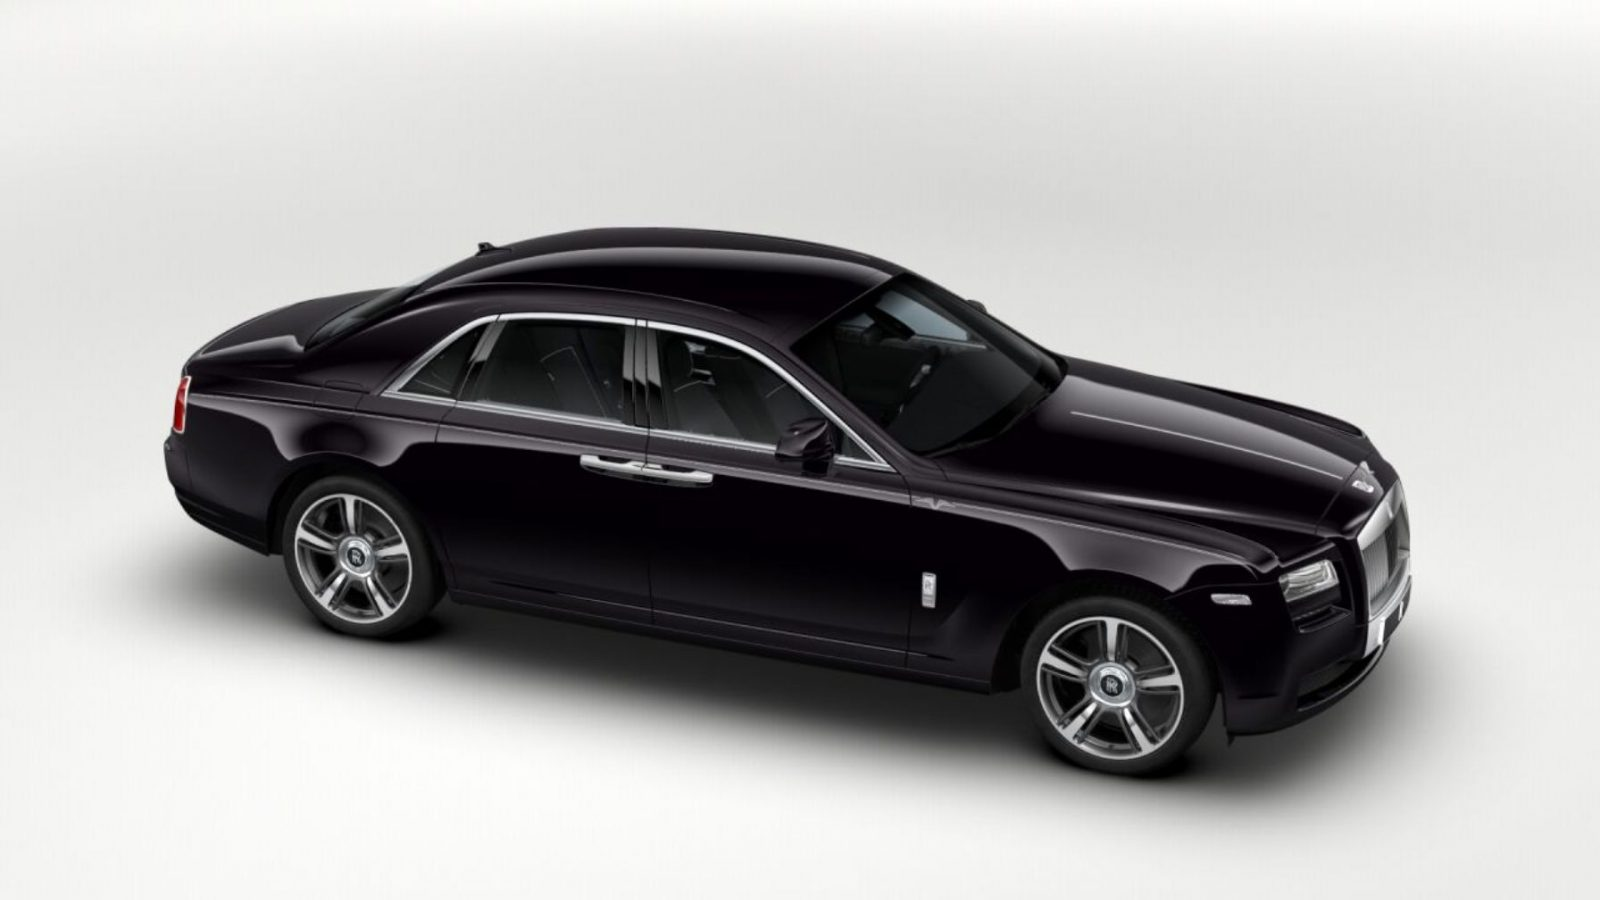 2014 Rolls-Royce Ghost V-Spec Adds Power + Dark Glamour to ...